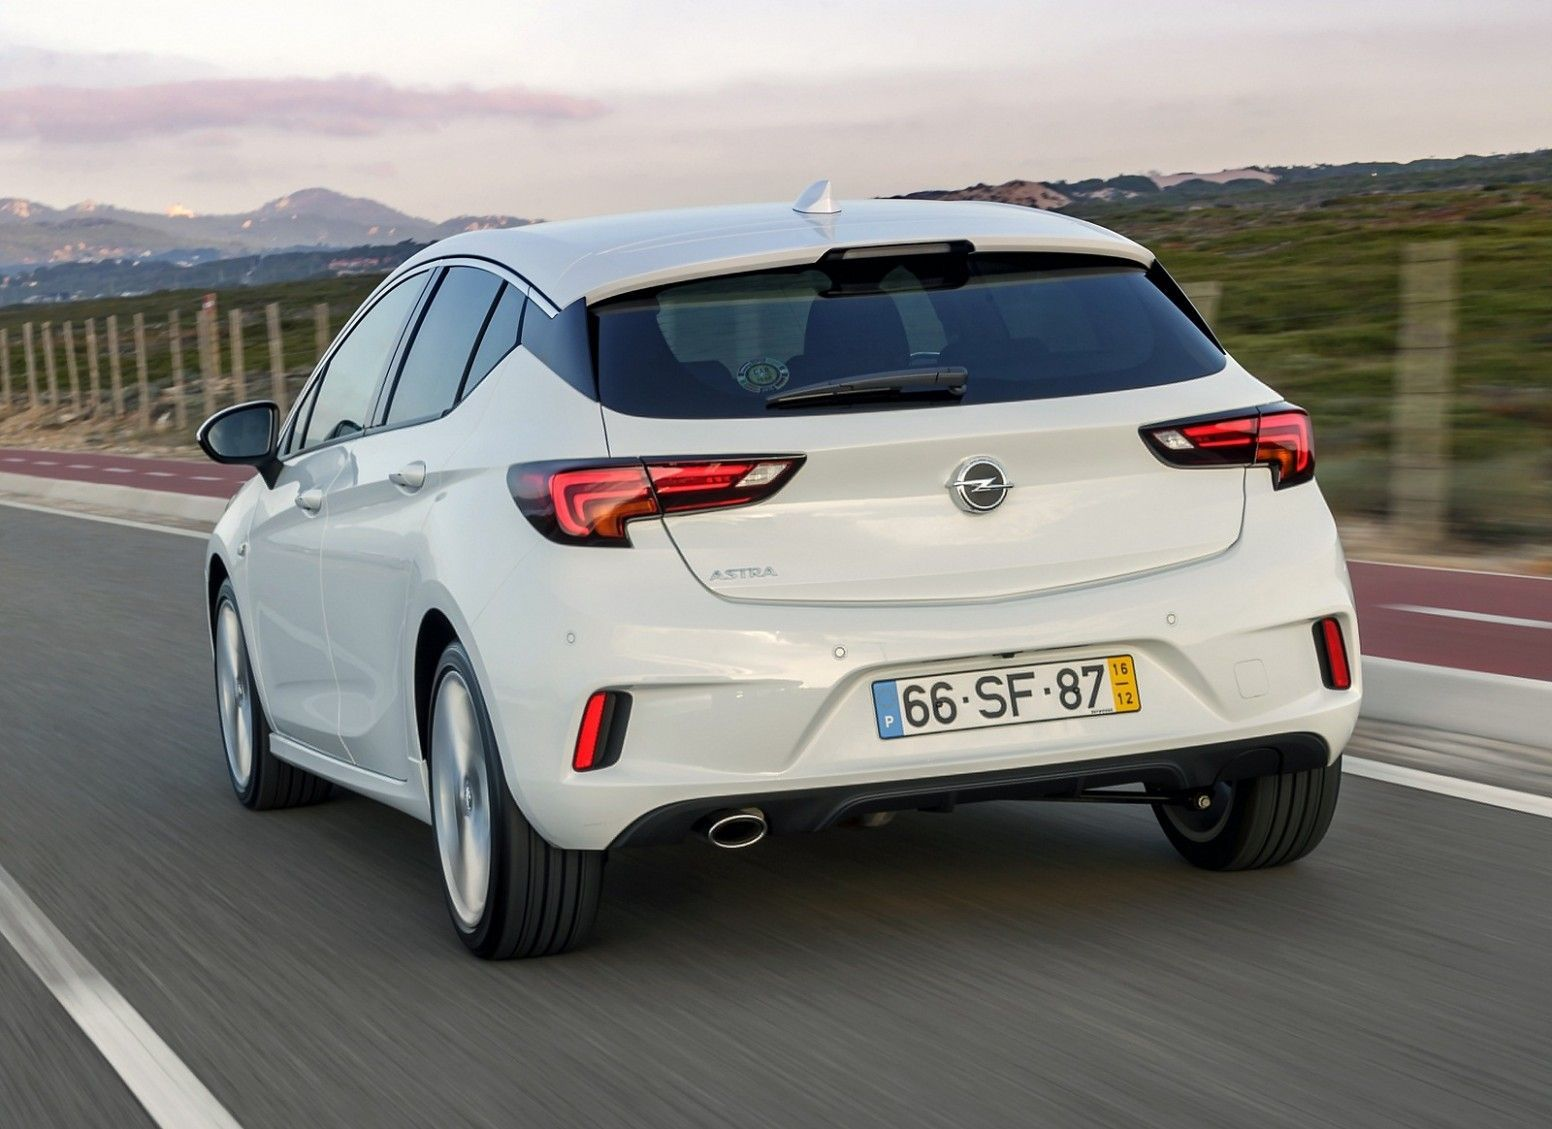 2020 Opel Astra Sedan Redesign And Concept Astra Concept Redesign Sedan Autosopel 2020